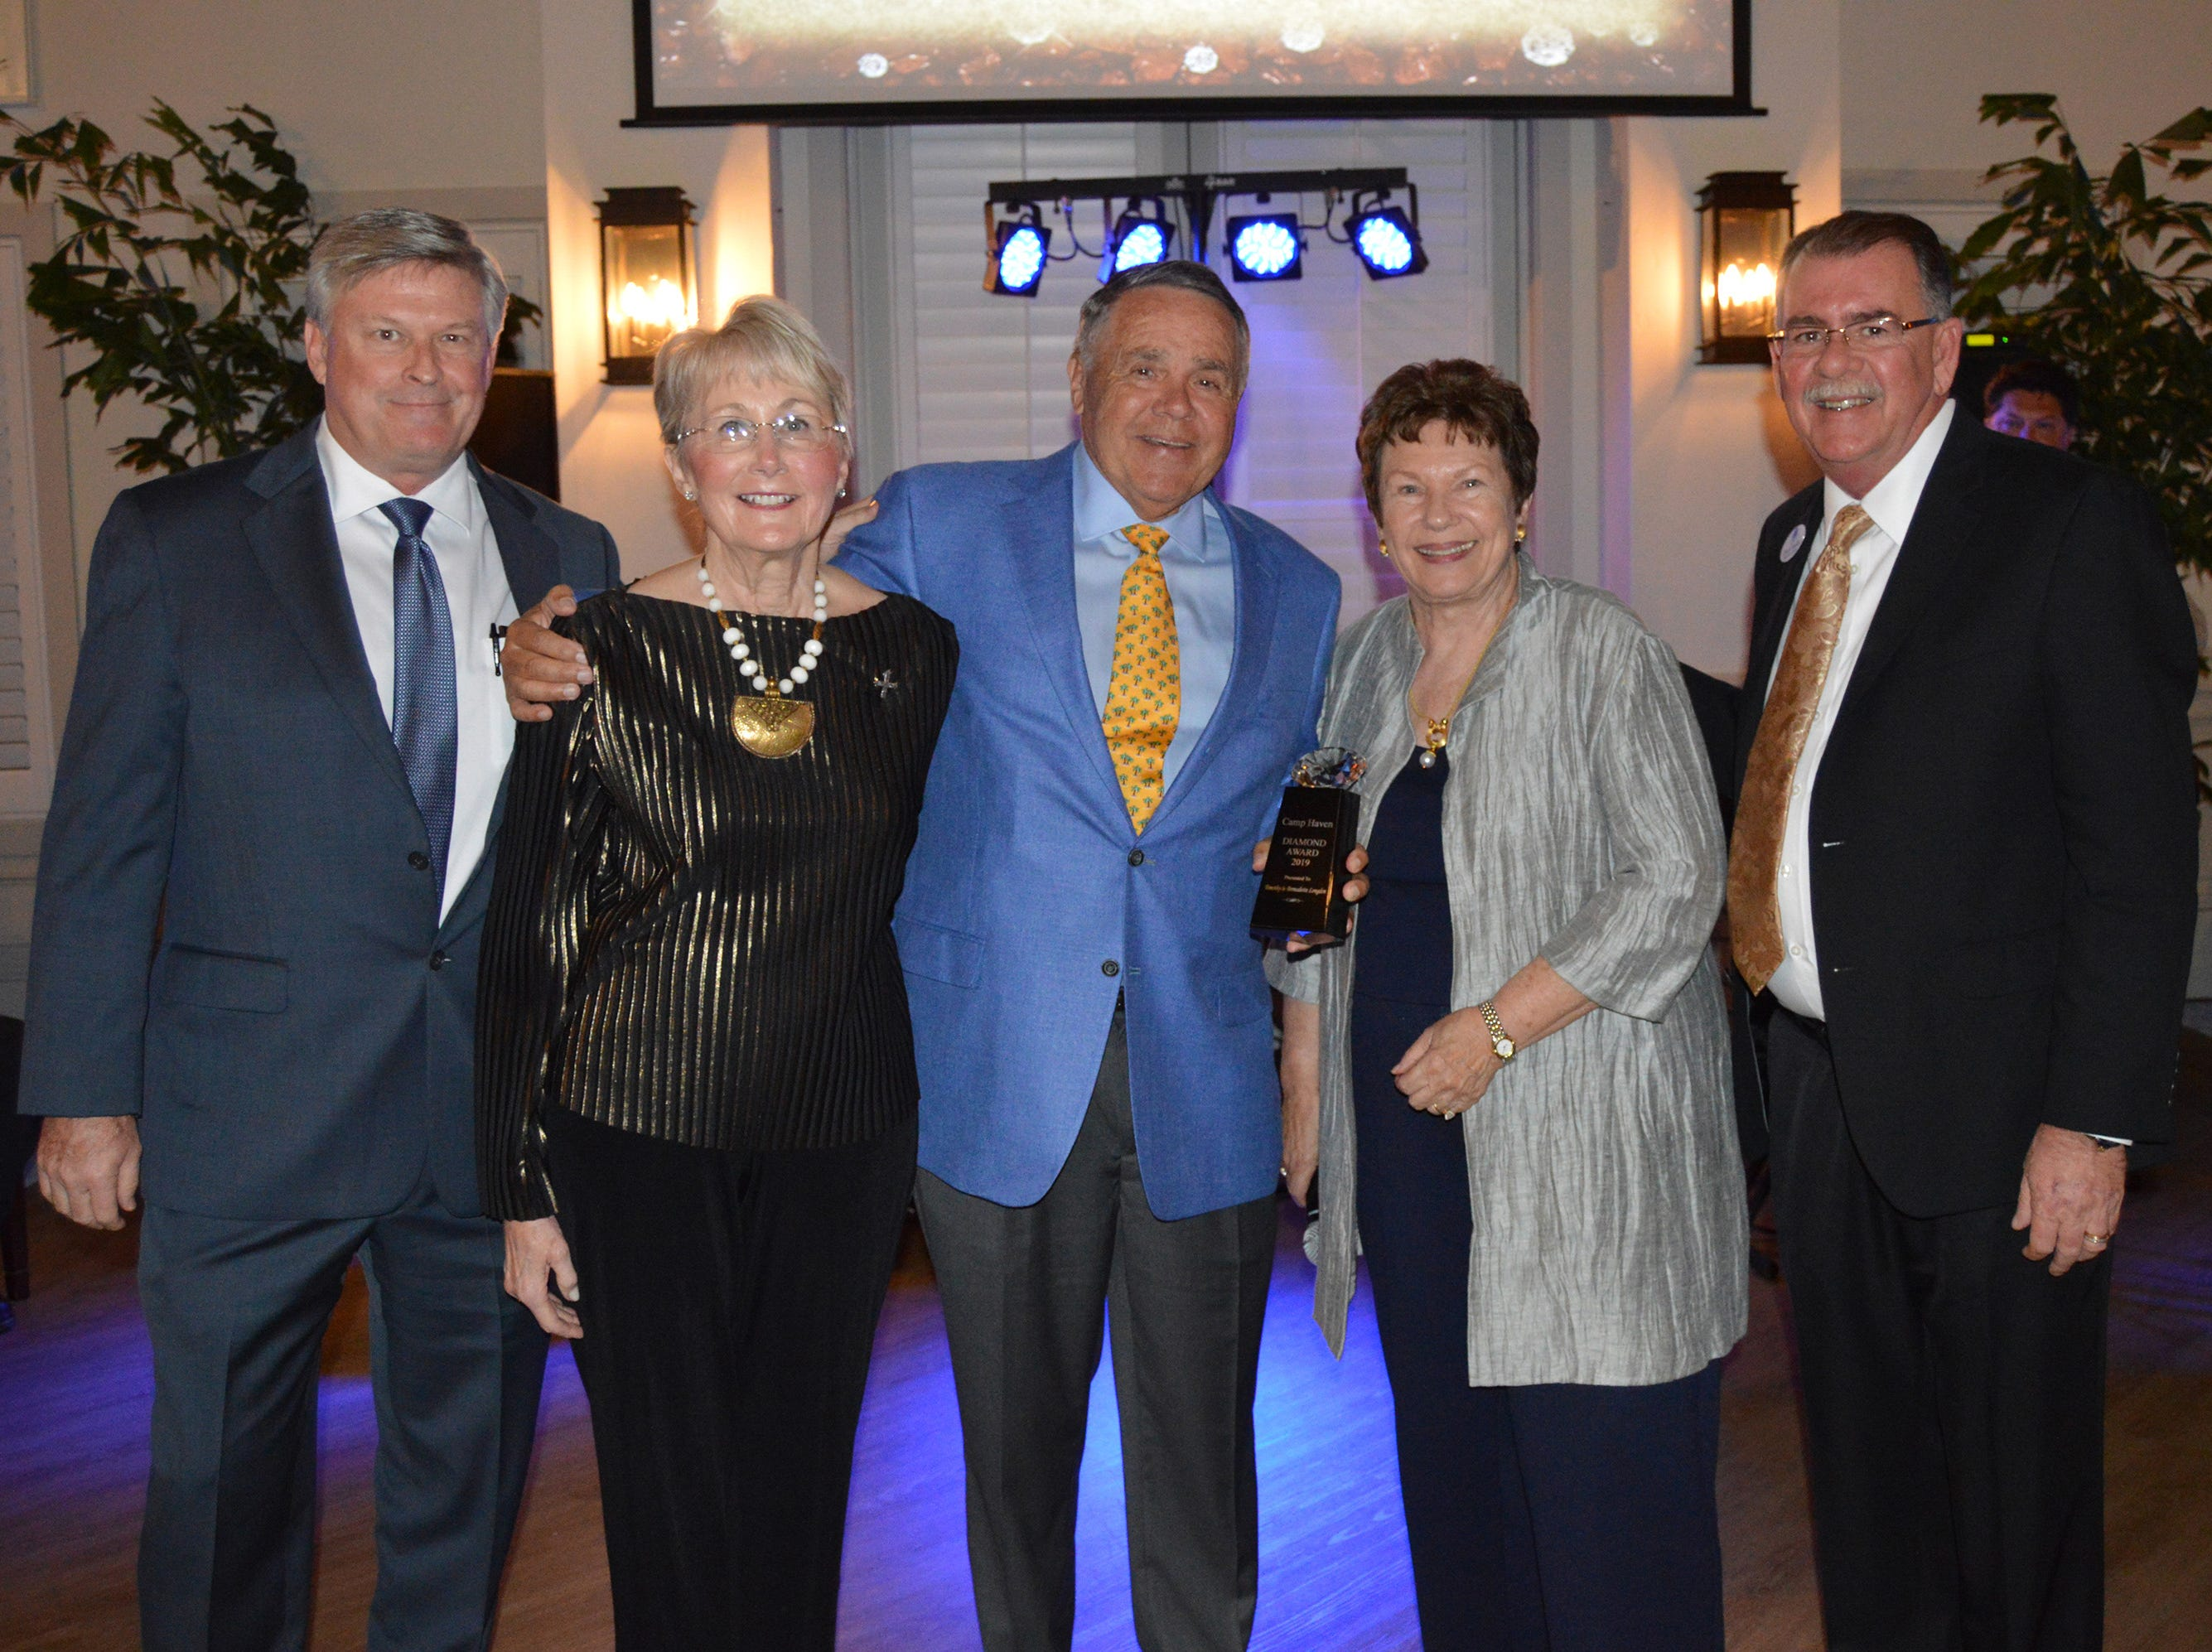 Brian Korkus, left, Bernadette and Tim Longden, Linda Teetz and Chuck Bradley at the Diamonds in the Rough Gala at Grand Harbor Golf & Beach Club on Jan.24.